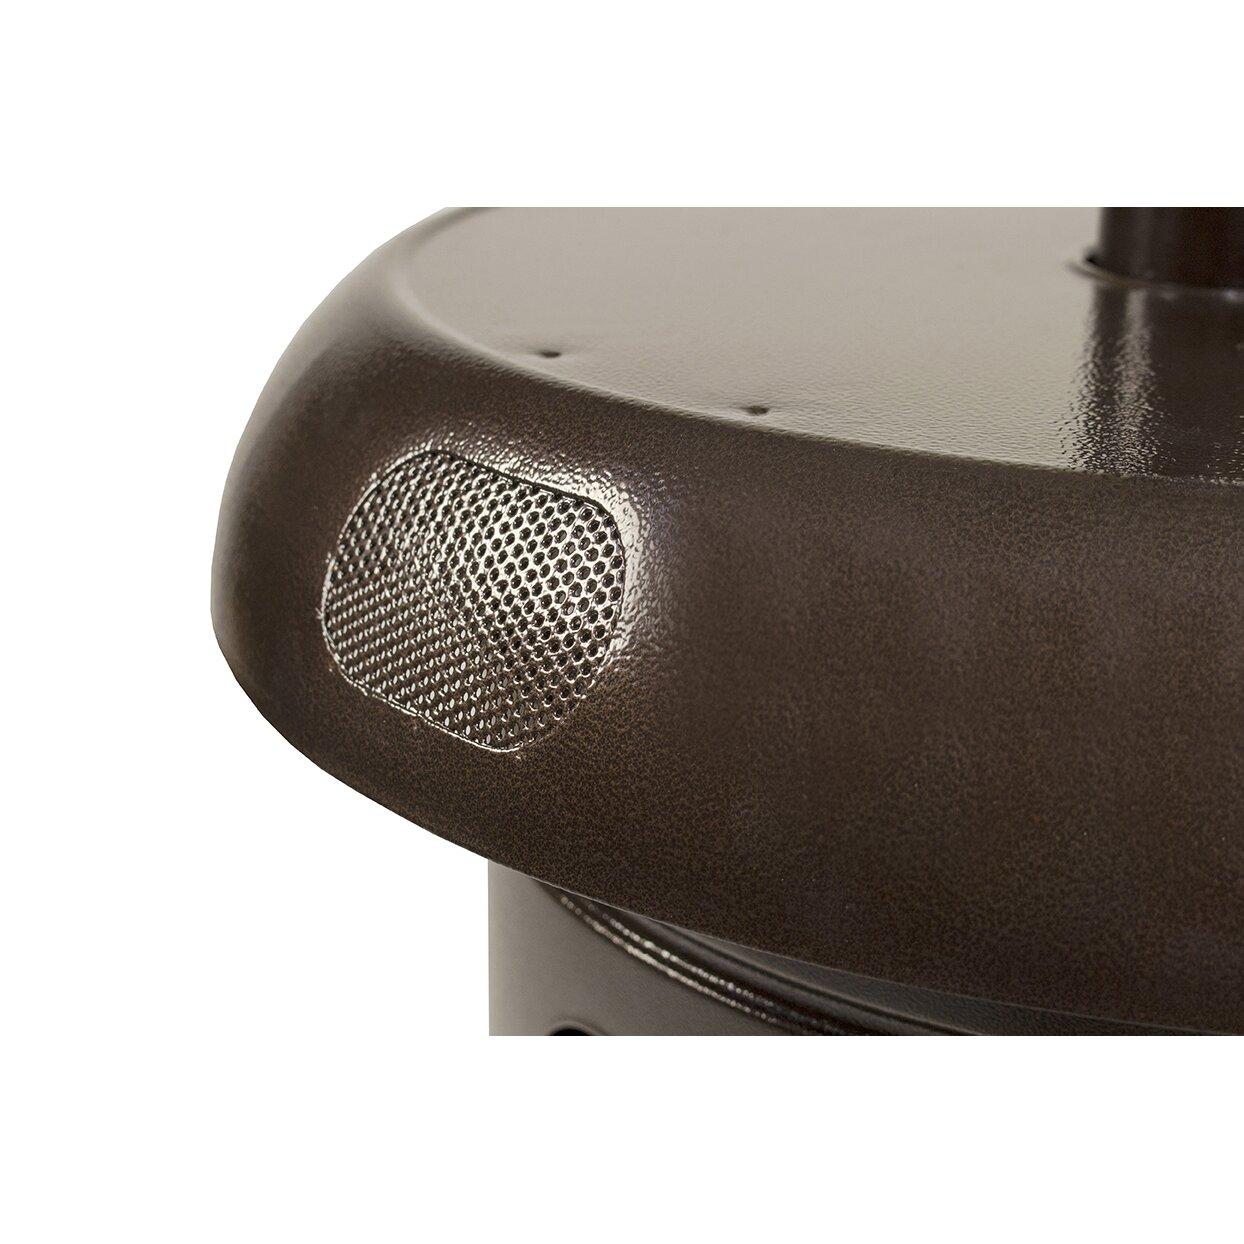 Mirage Heat Focus 38 200 Btu Propane Patio Heater With Speaker And   Mirage  Heat Focusing